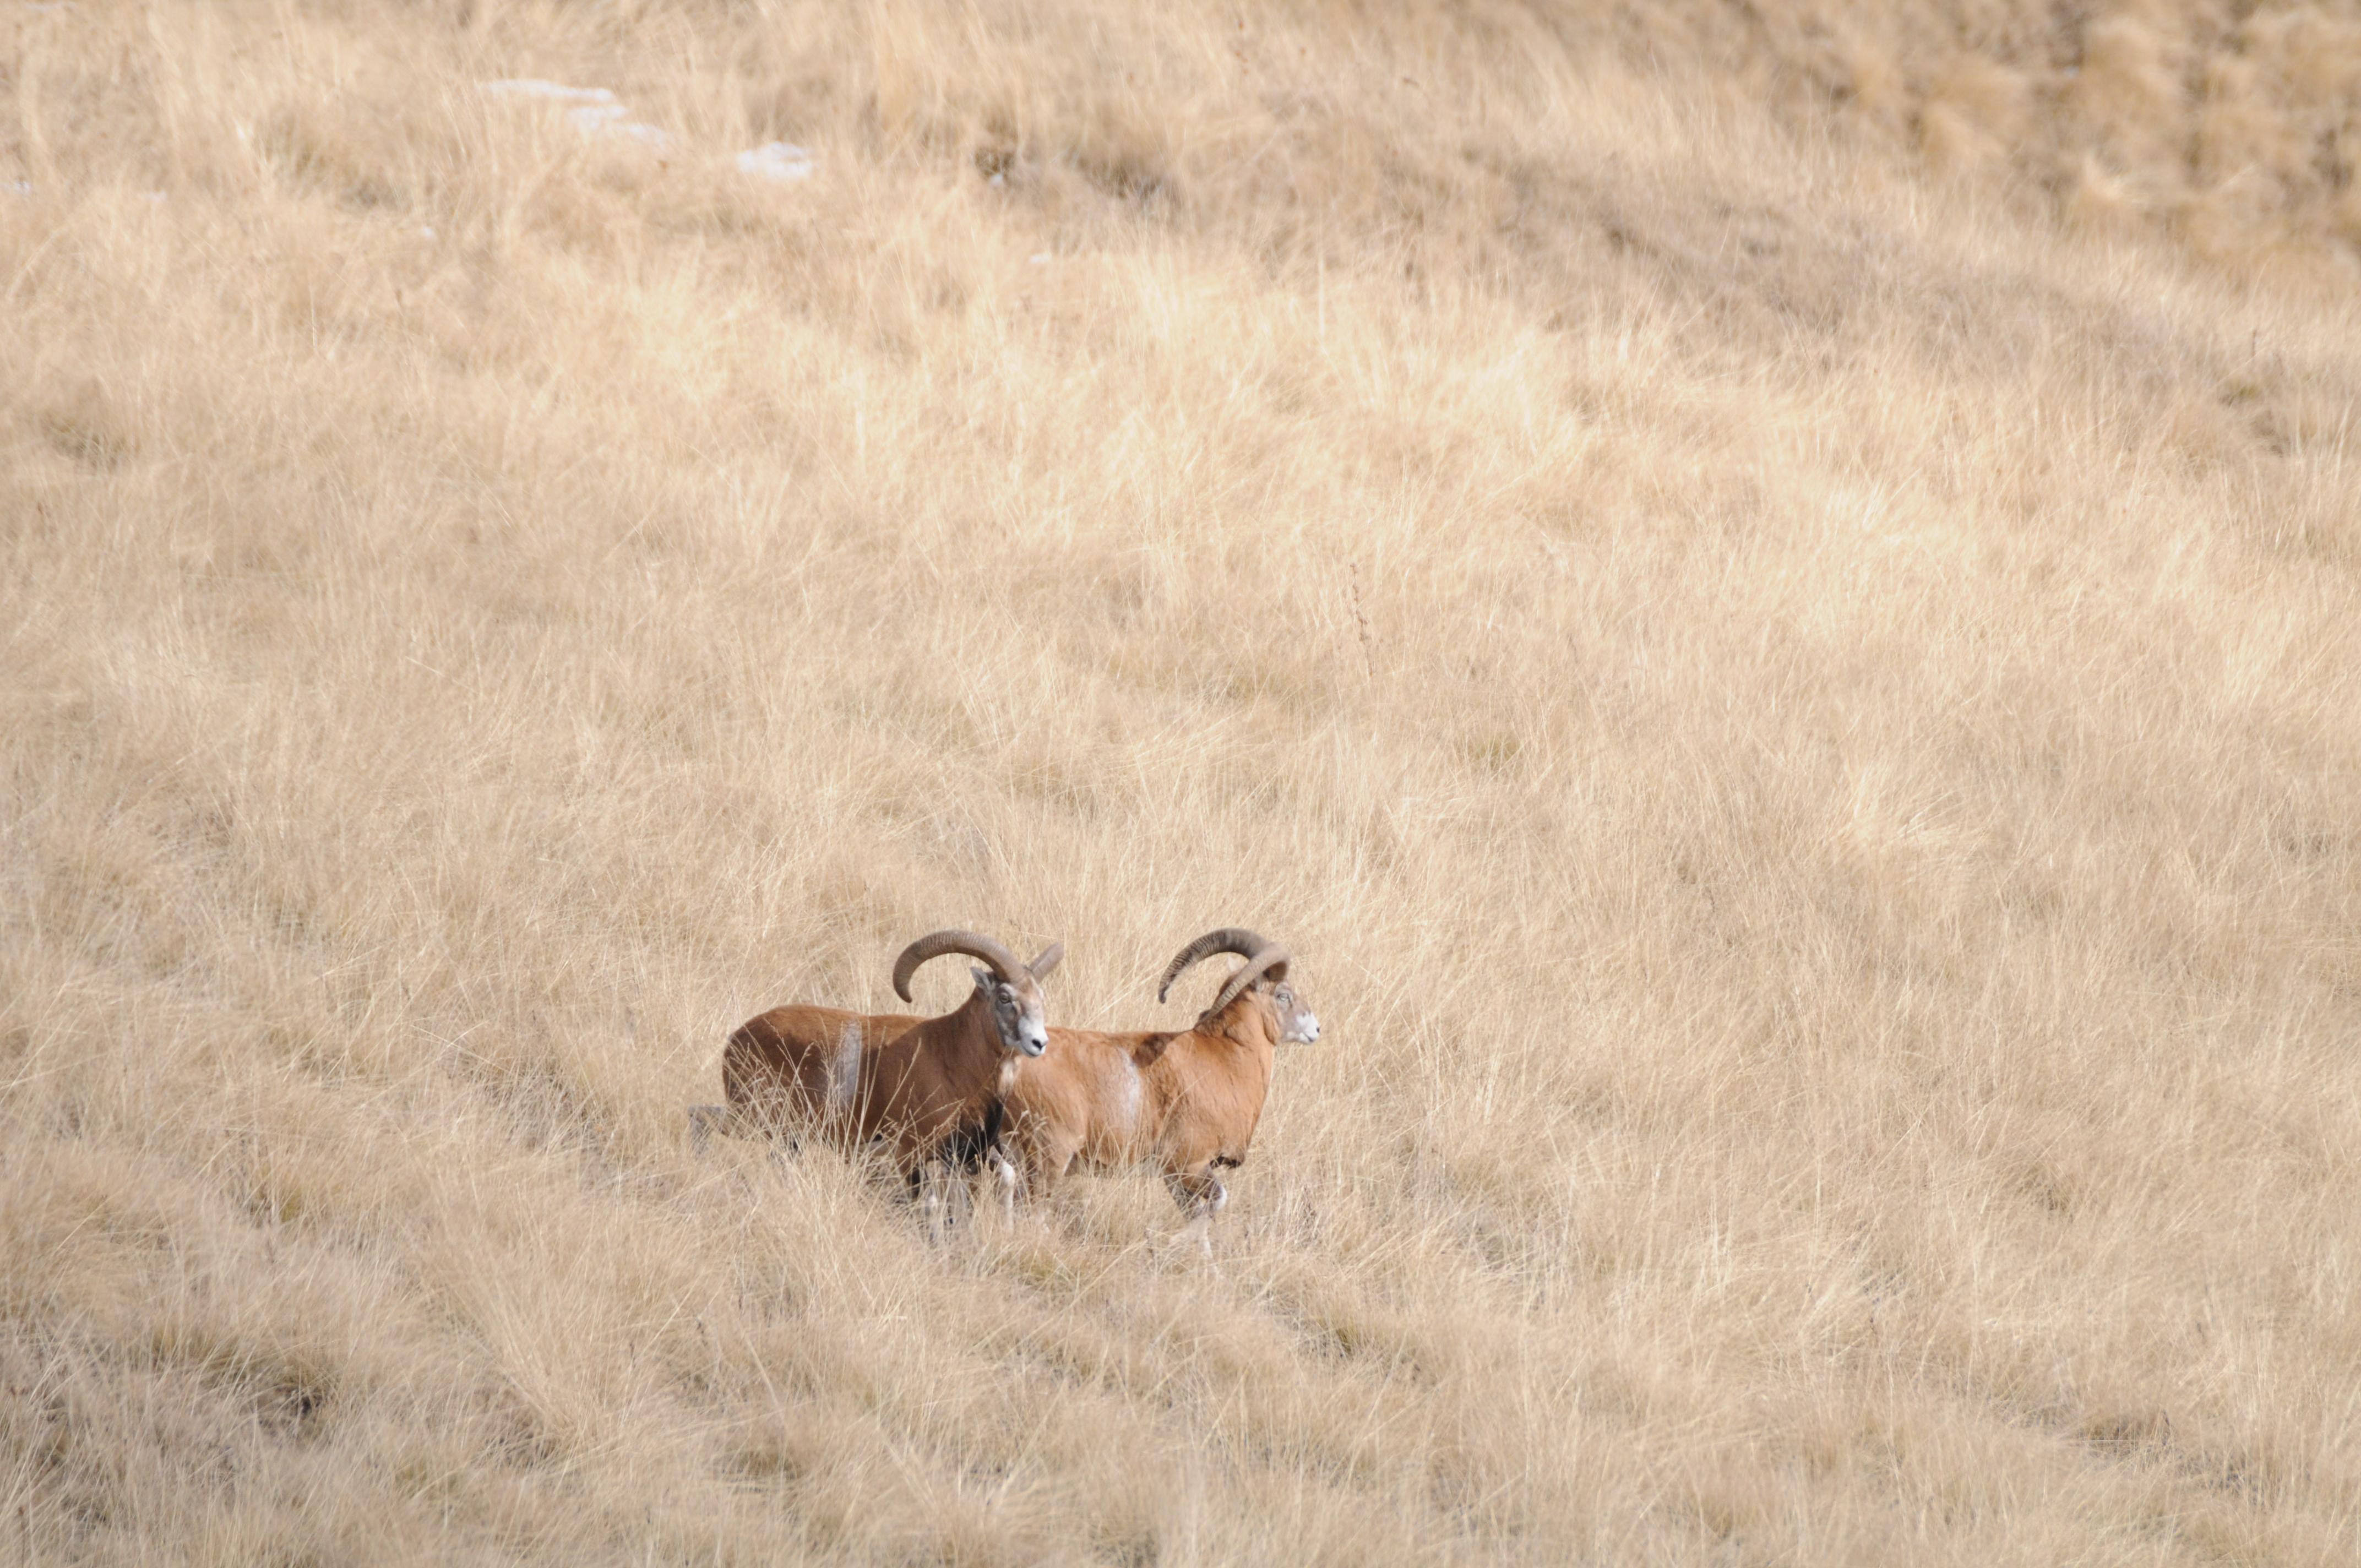 Armenia_Armenian Mouflon 3